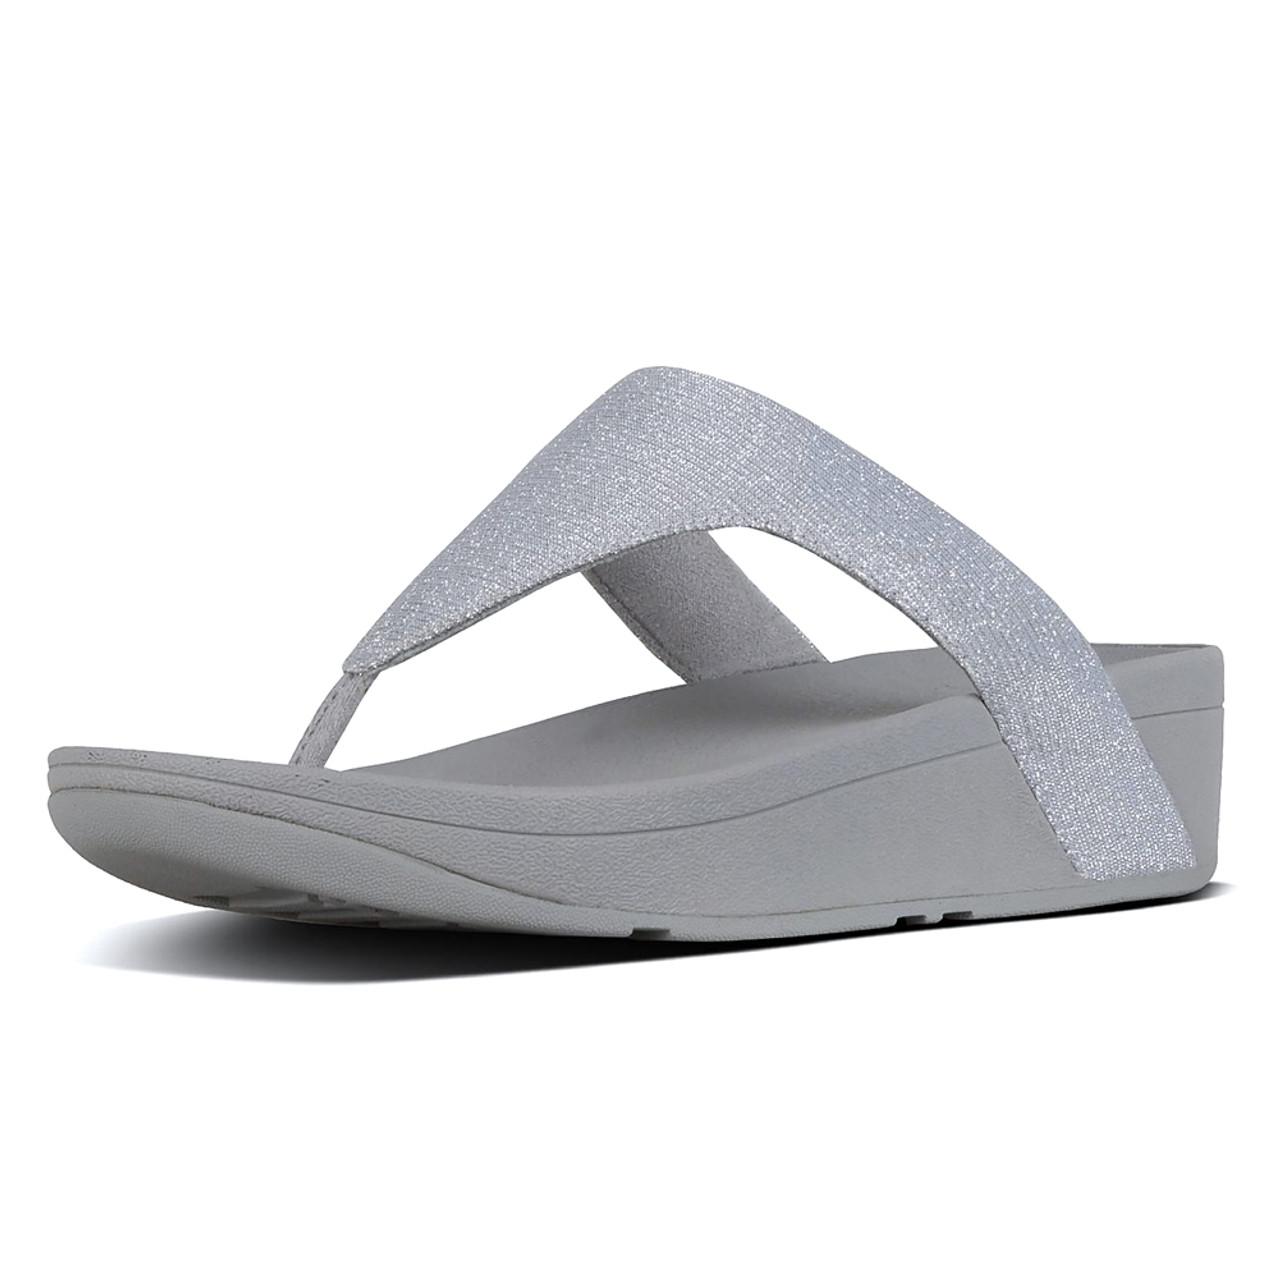 393bdeb88 Fitflop Women s Lottie Glitzy Thong Sandal Silver - Shop now   Shoolu.com